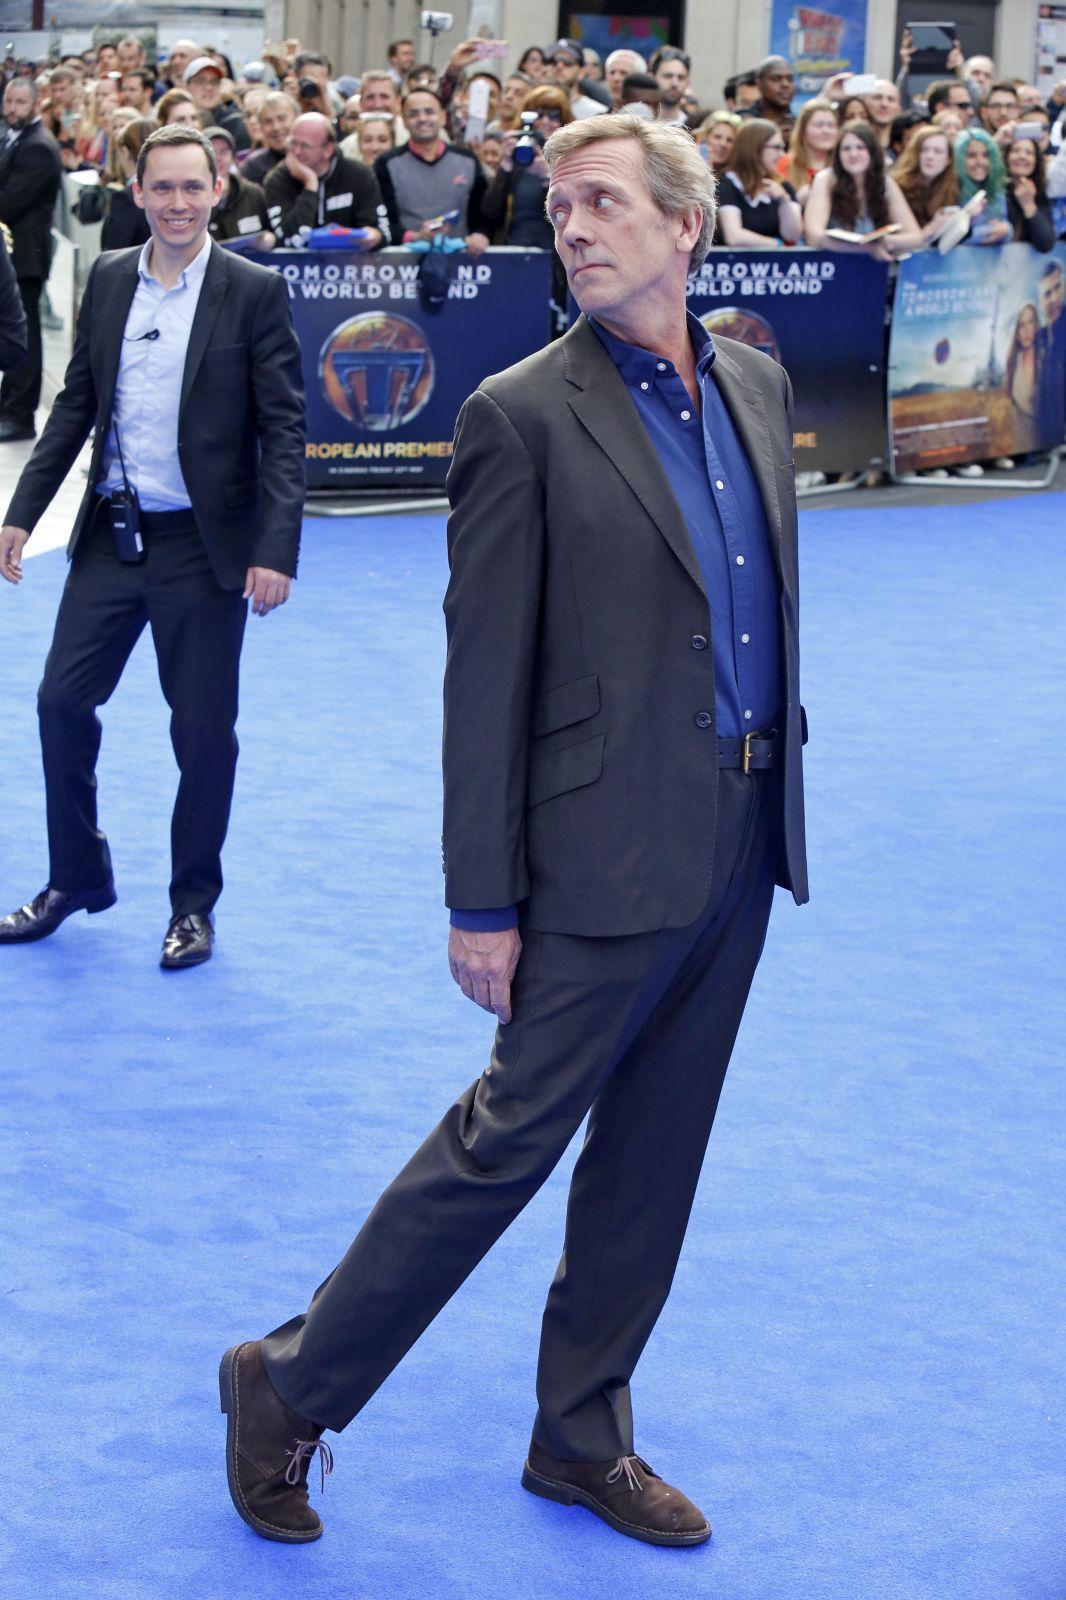 Hugh Laurie95 - Tomorrowland Premiere London 2015.jpg